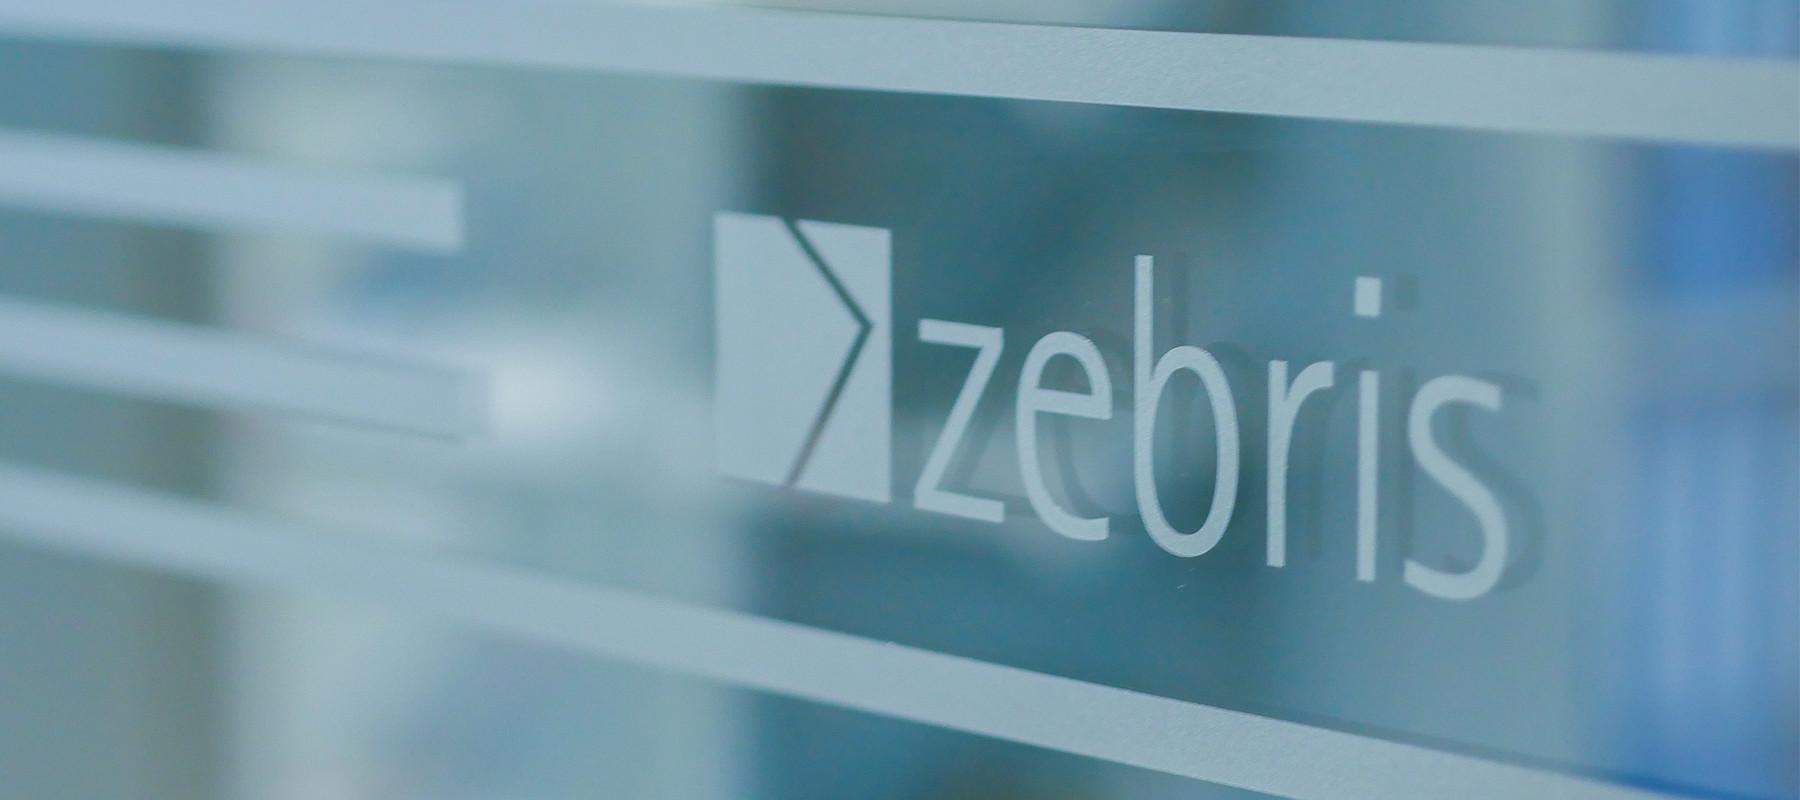 Zebris中国 | 下颌运动分析系统